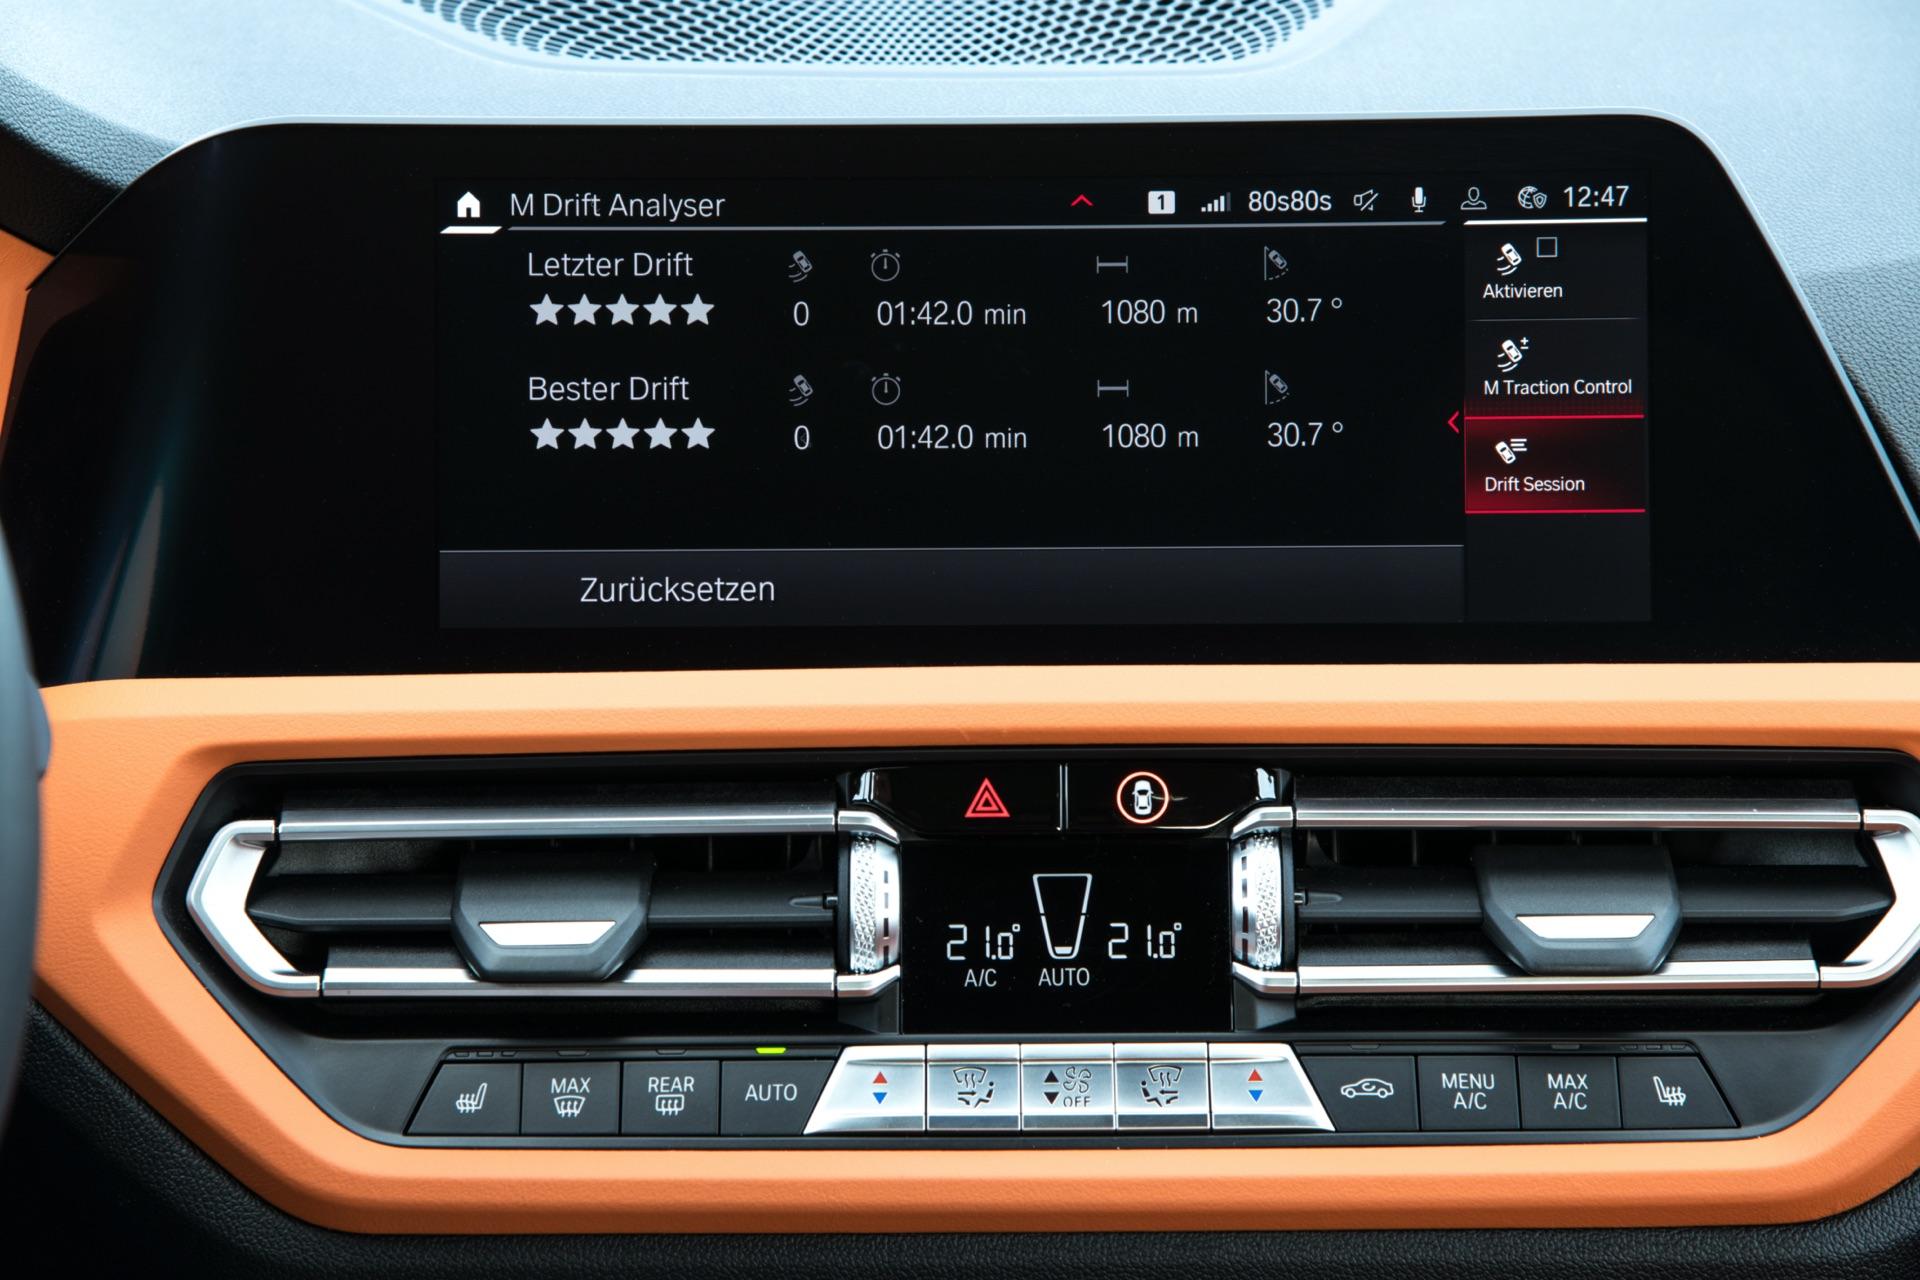 2022 BMW M3 screen